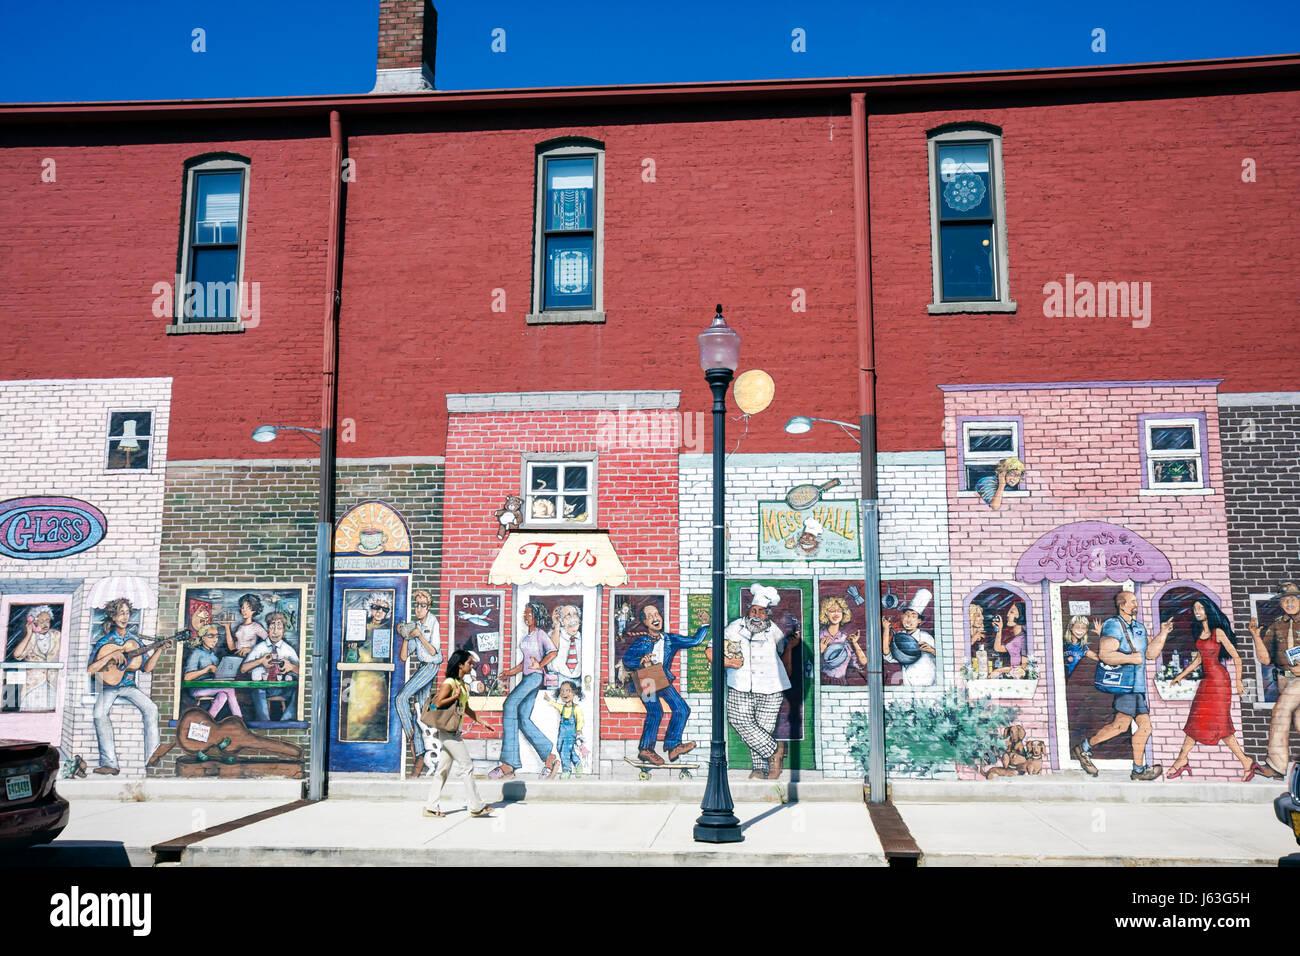 Indiana Valparaiso Michigan Avenue Lifestyles Building mural brick building sidewalk store front shops street art - Stock Image